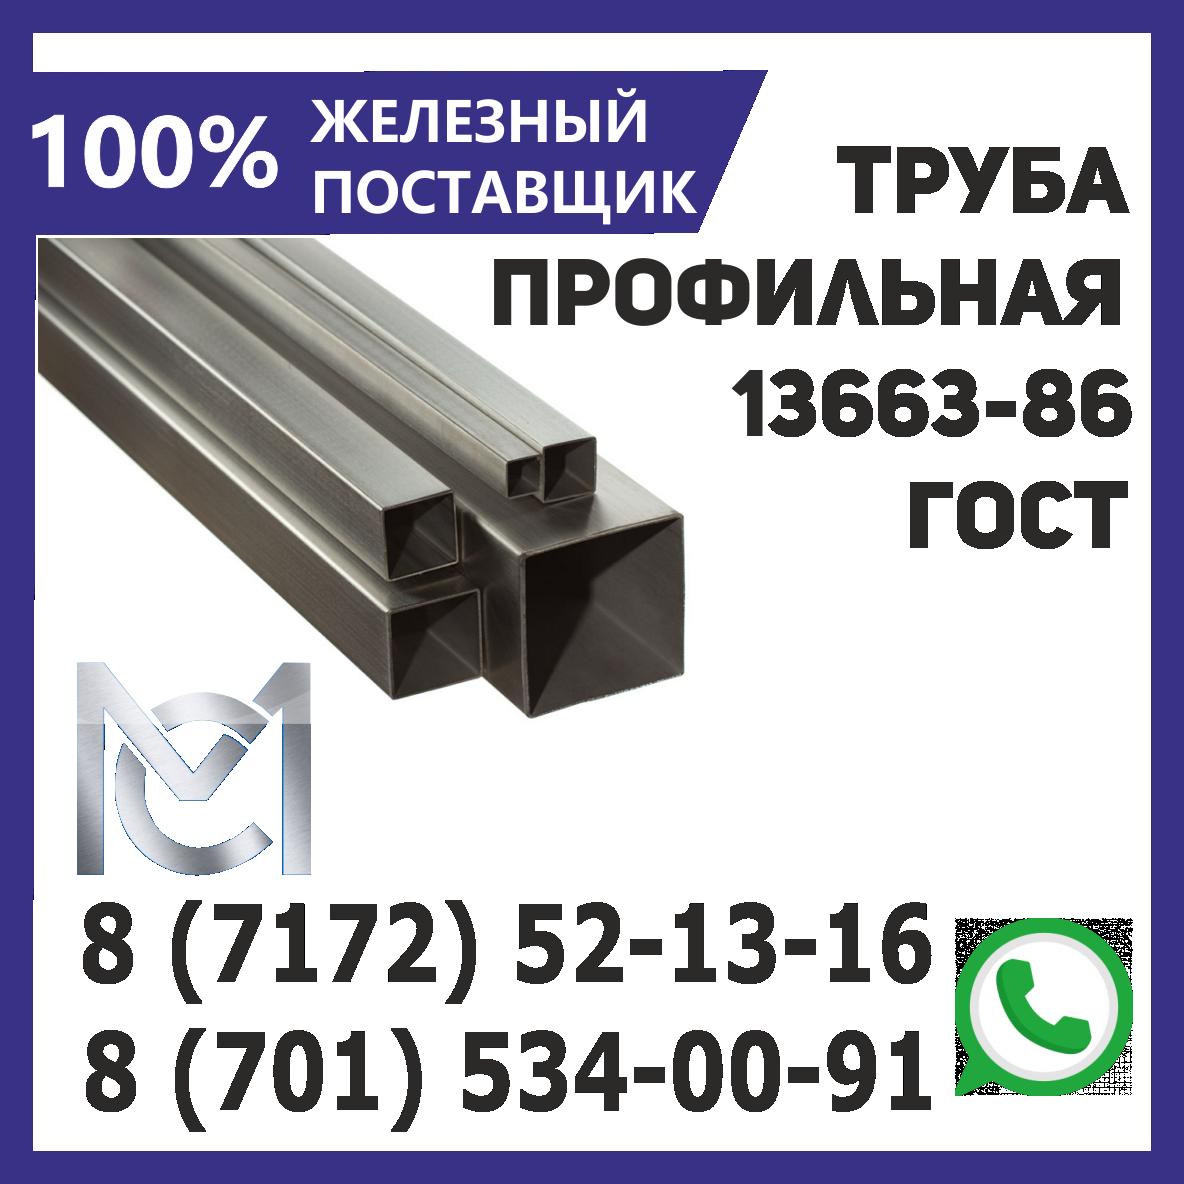 Труба профильная Д120х120 4мм ГОСТ 13663-86 стальная 12 метров